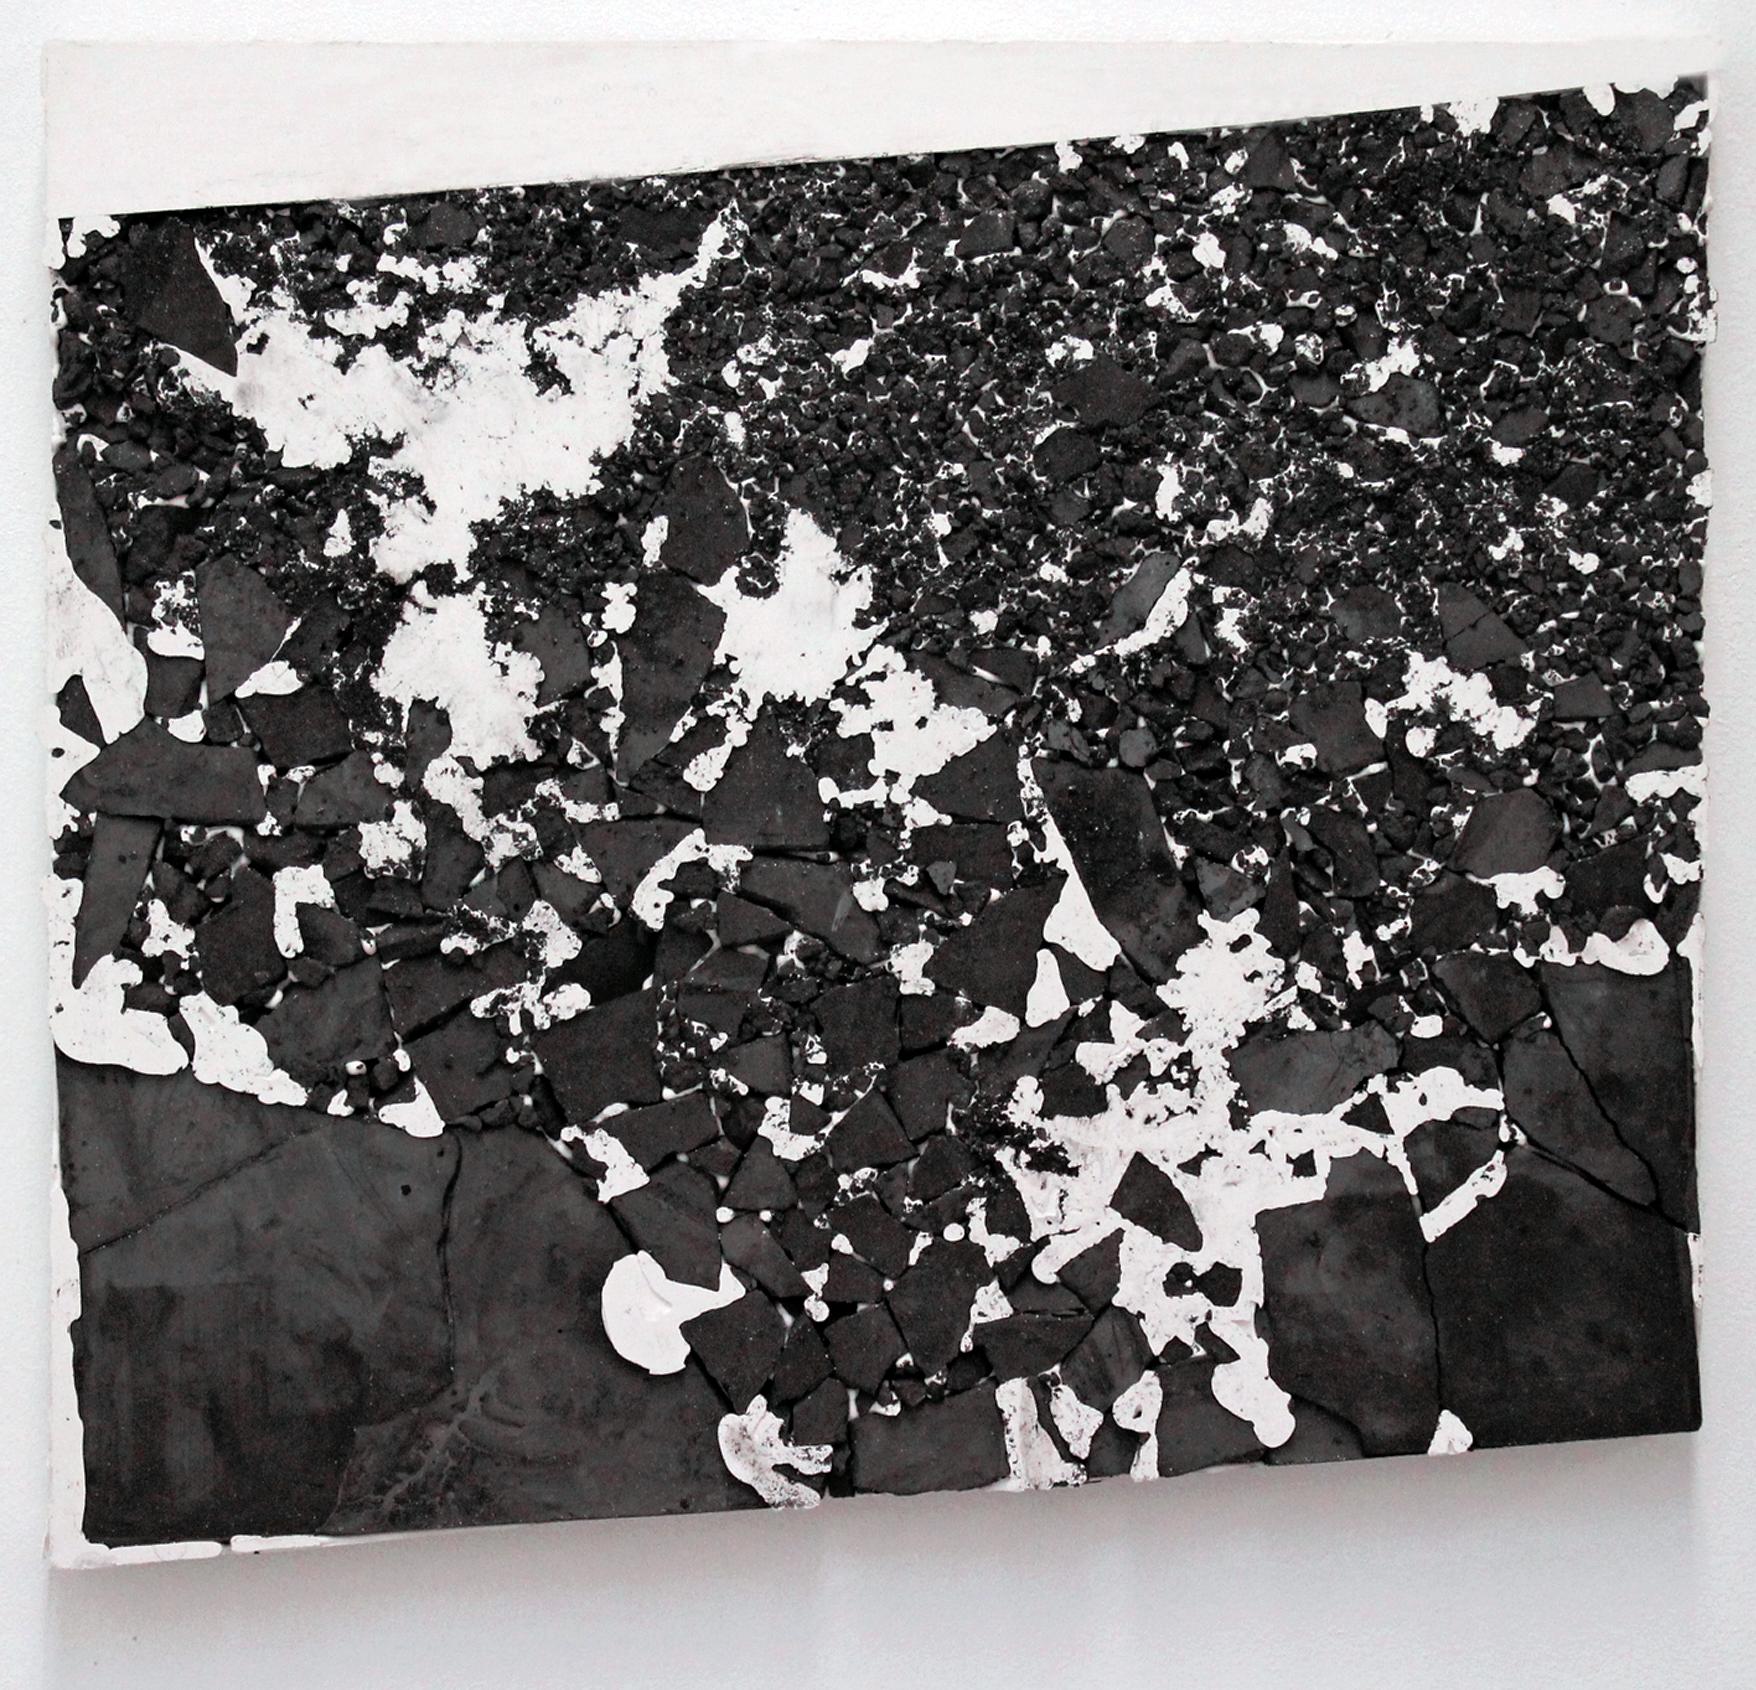 Untitled 1, 2011